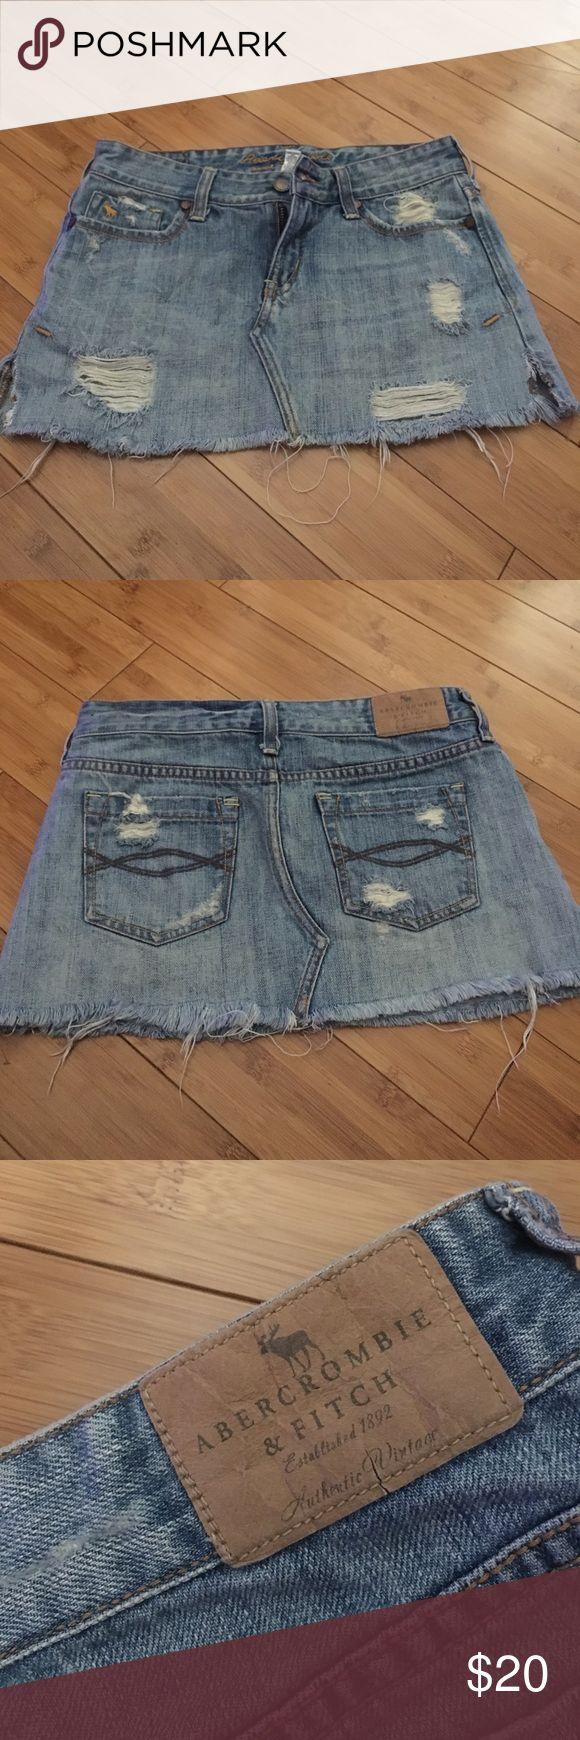 Abercrombie and Fitch short denim skirt Size 00 short mini denim skirt. Distressed look, good condition Abercrombie & Fitch Skirts Mini